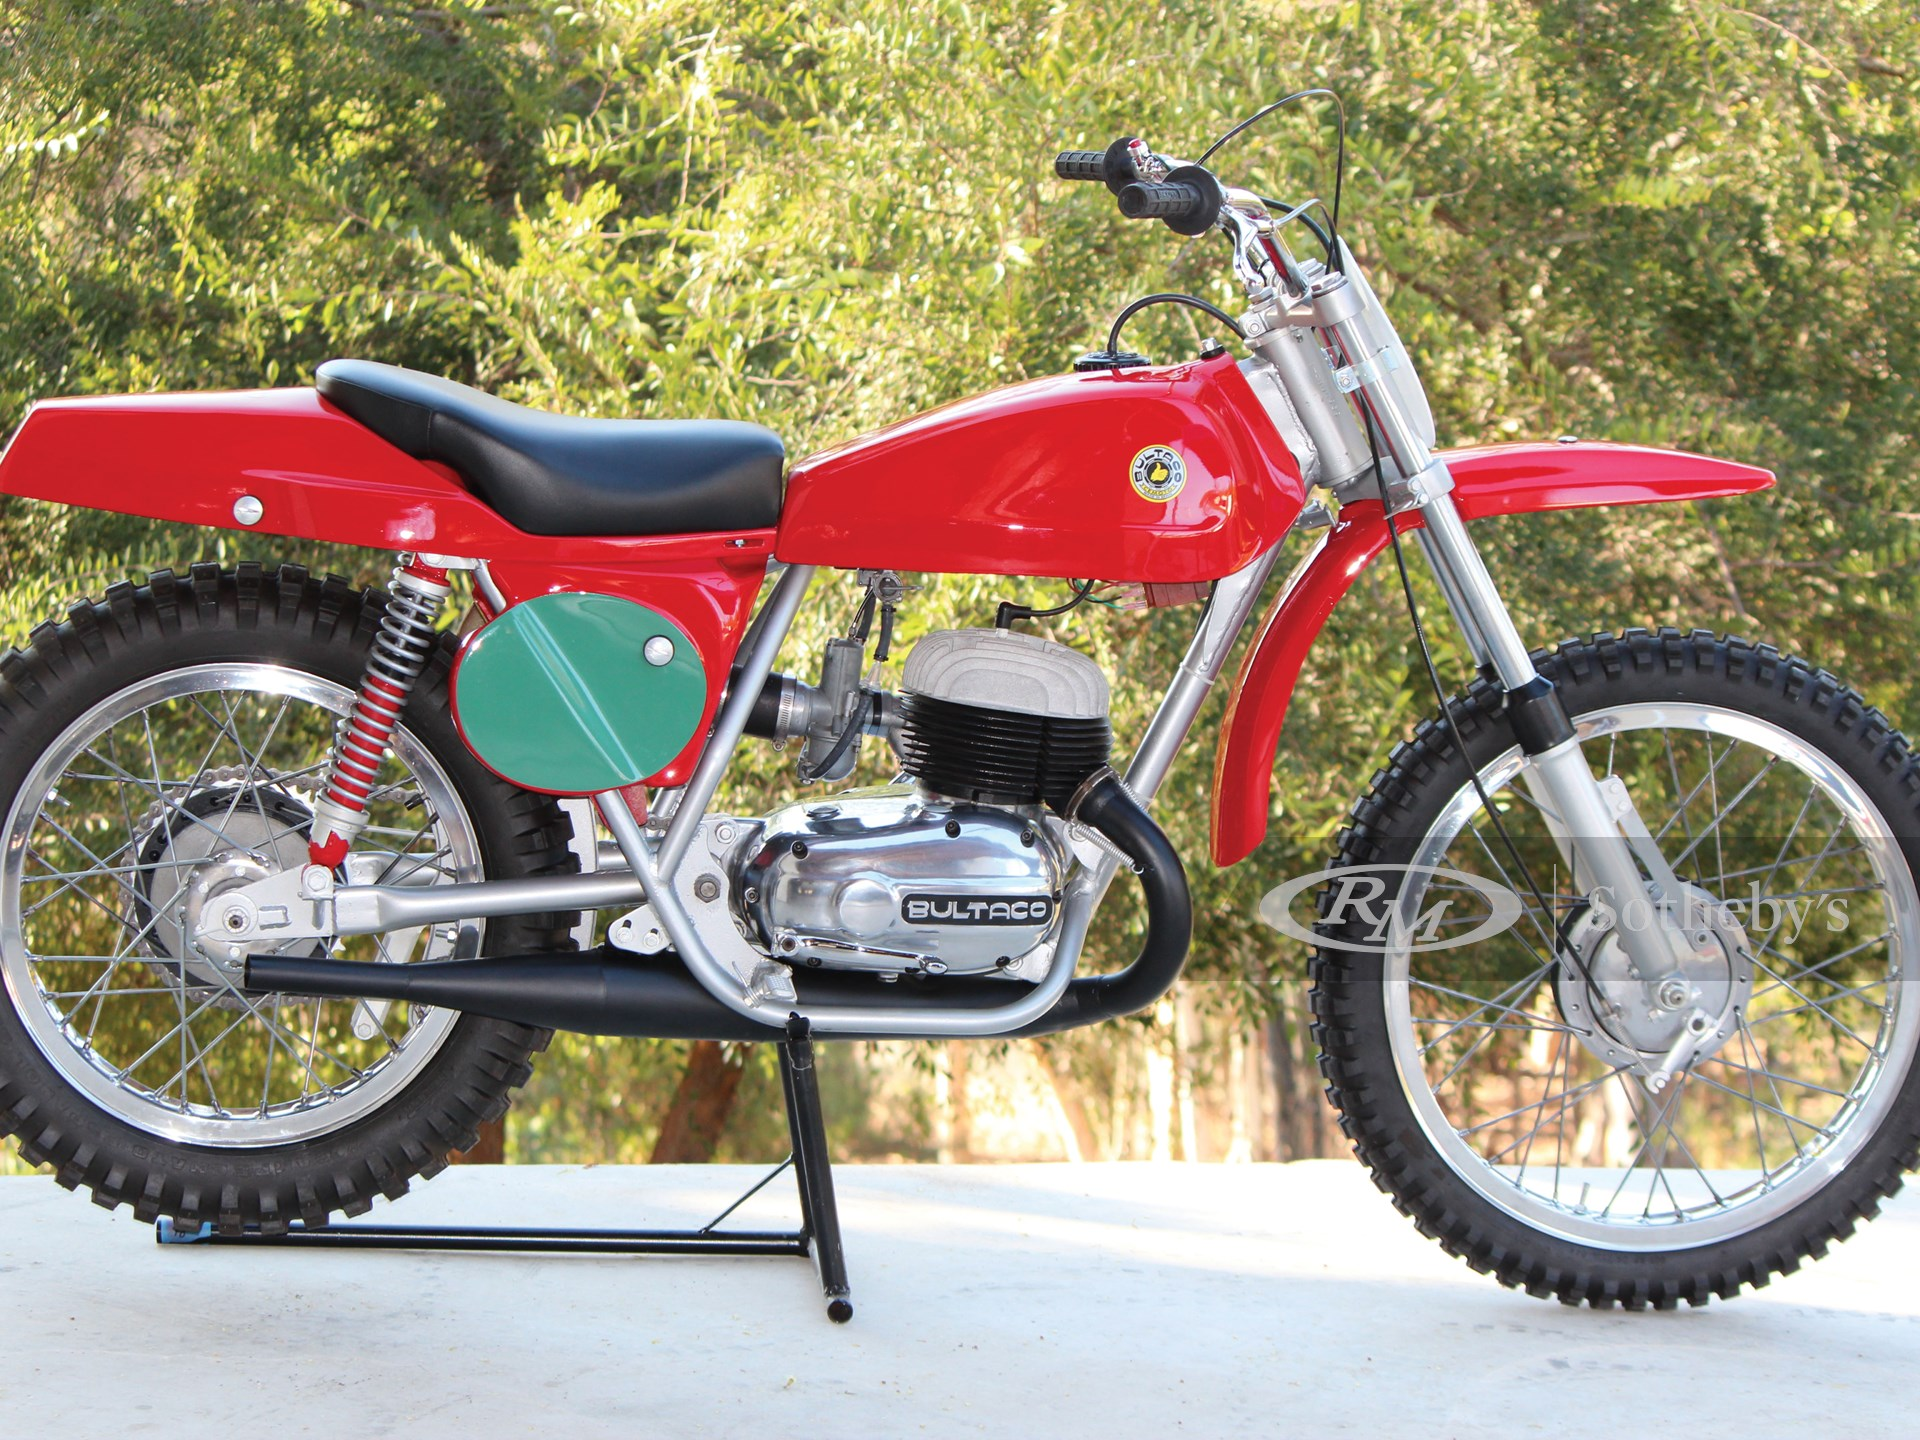 1969 Bultaco 250 Pursang